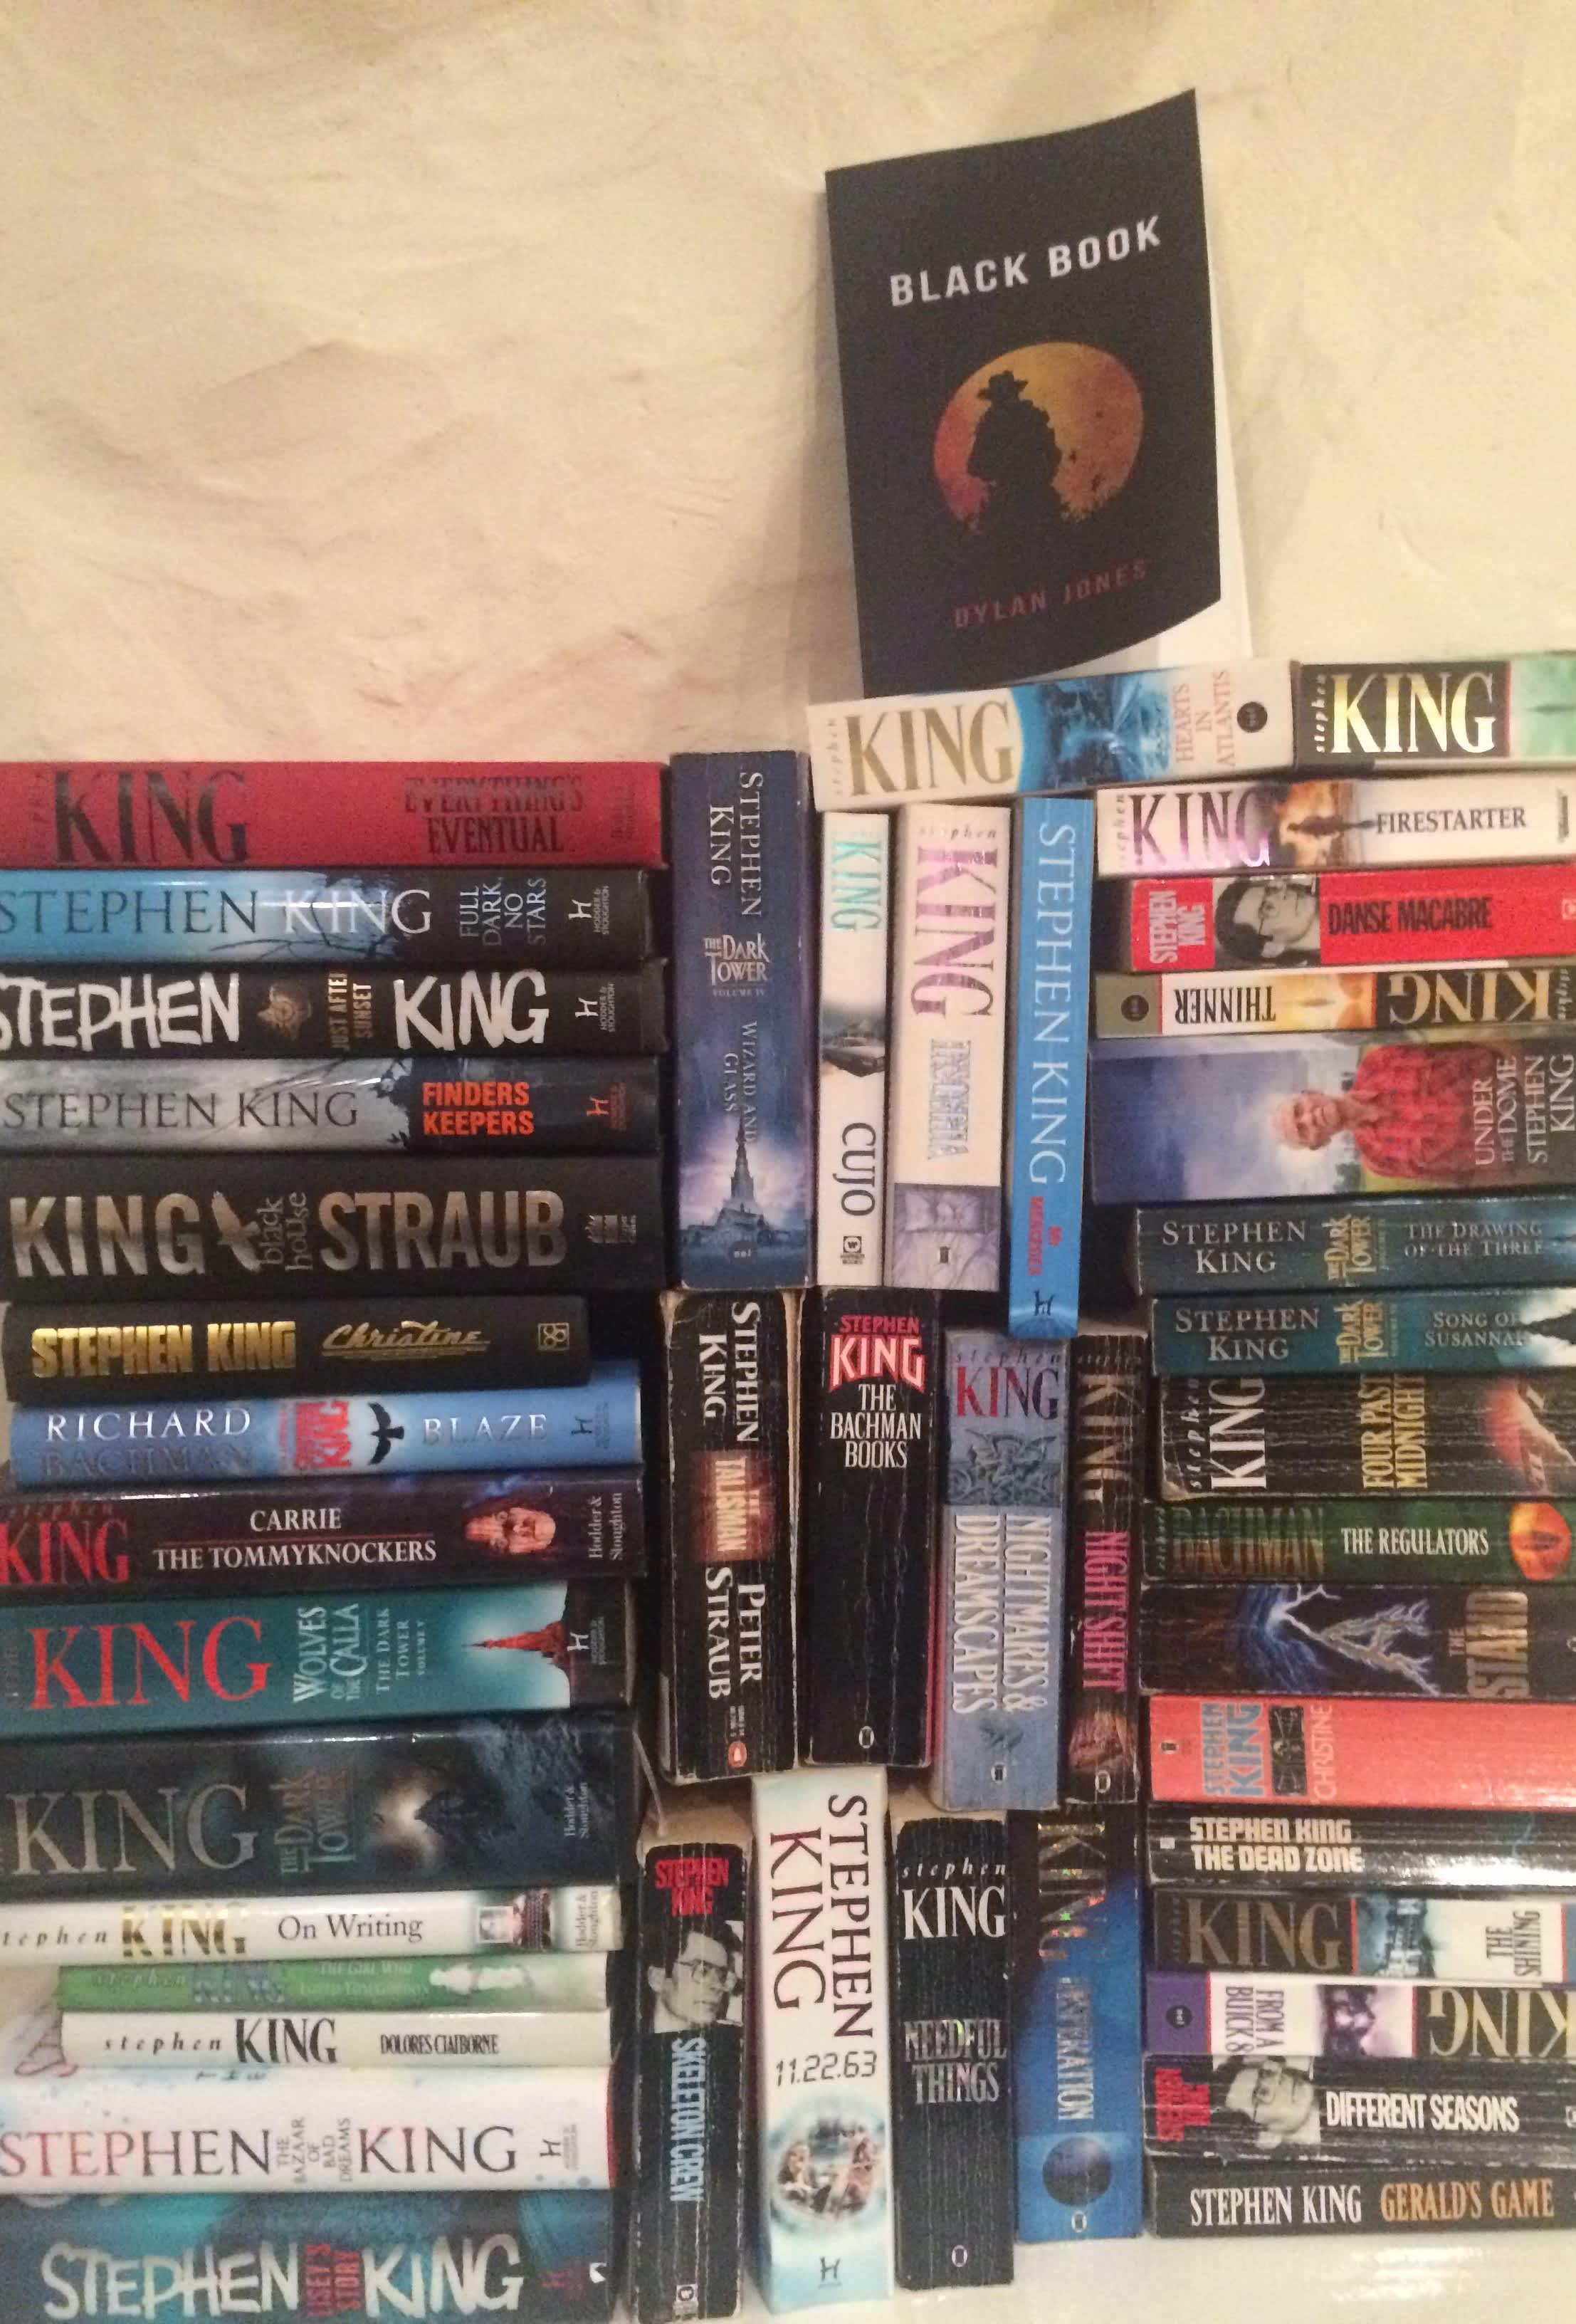 HANDOUT Dylan Jones Stephen King collection